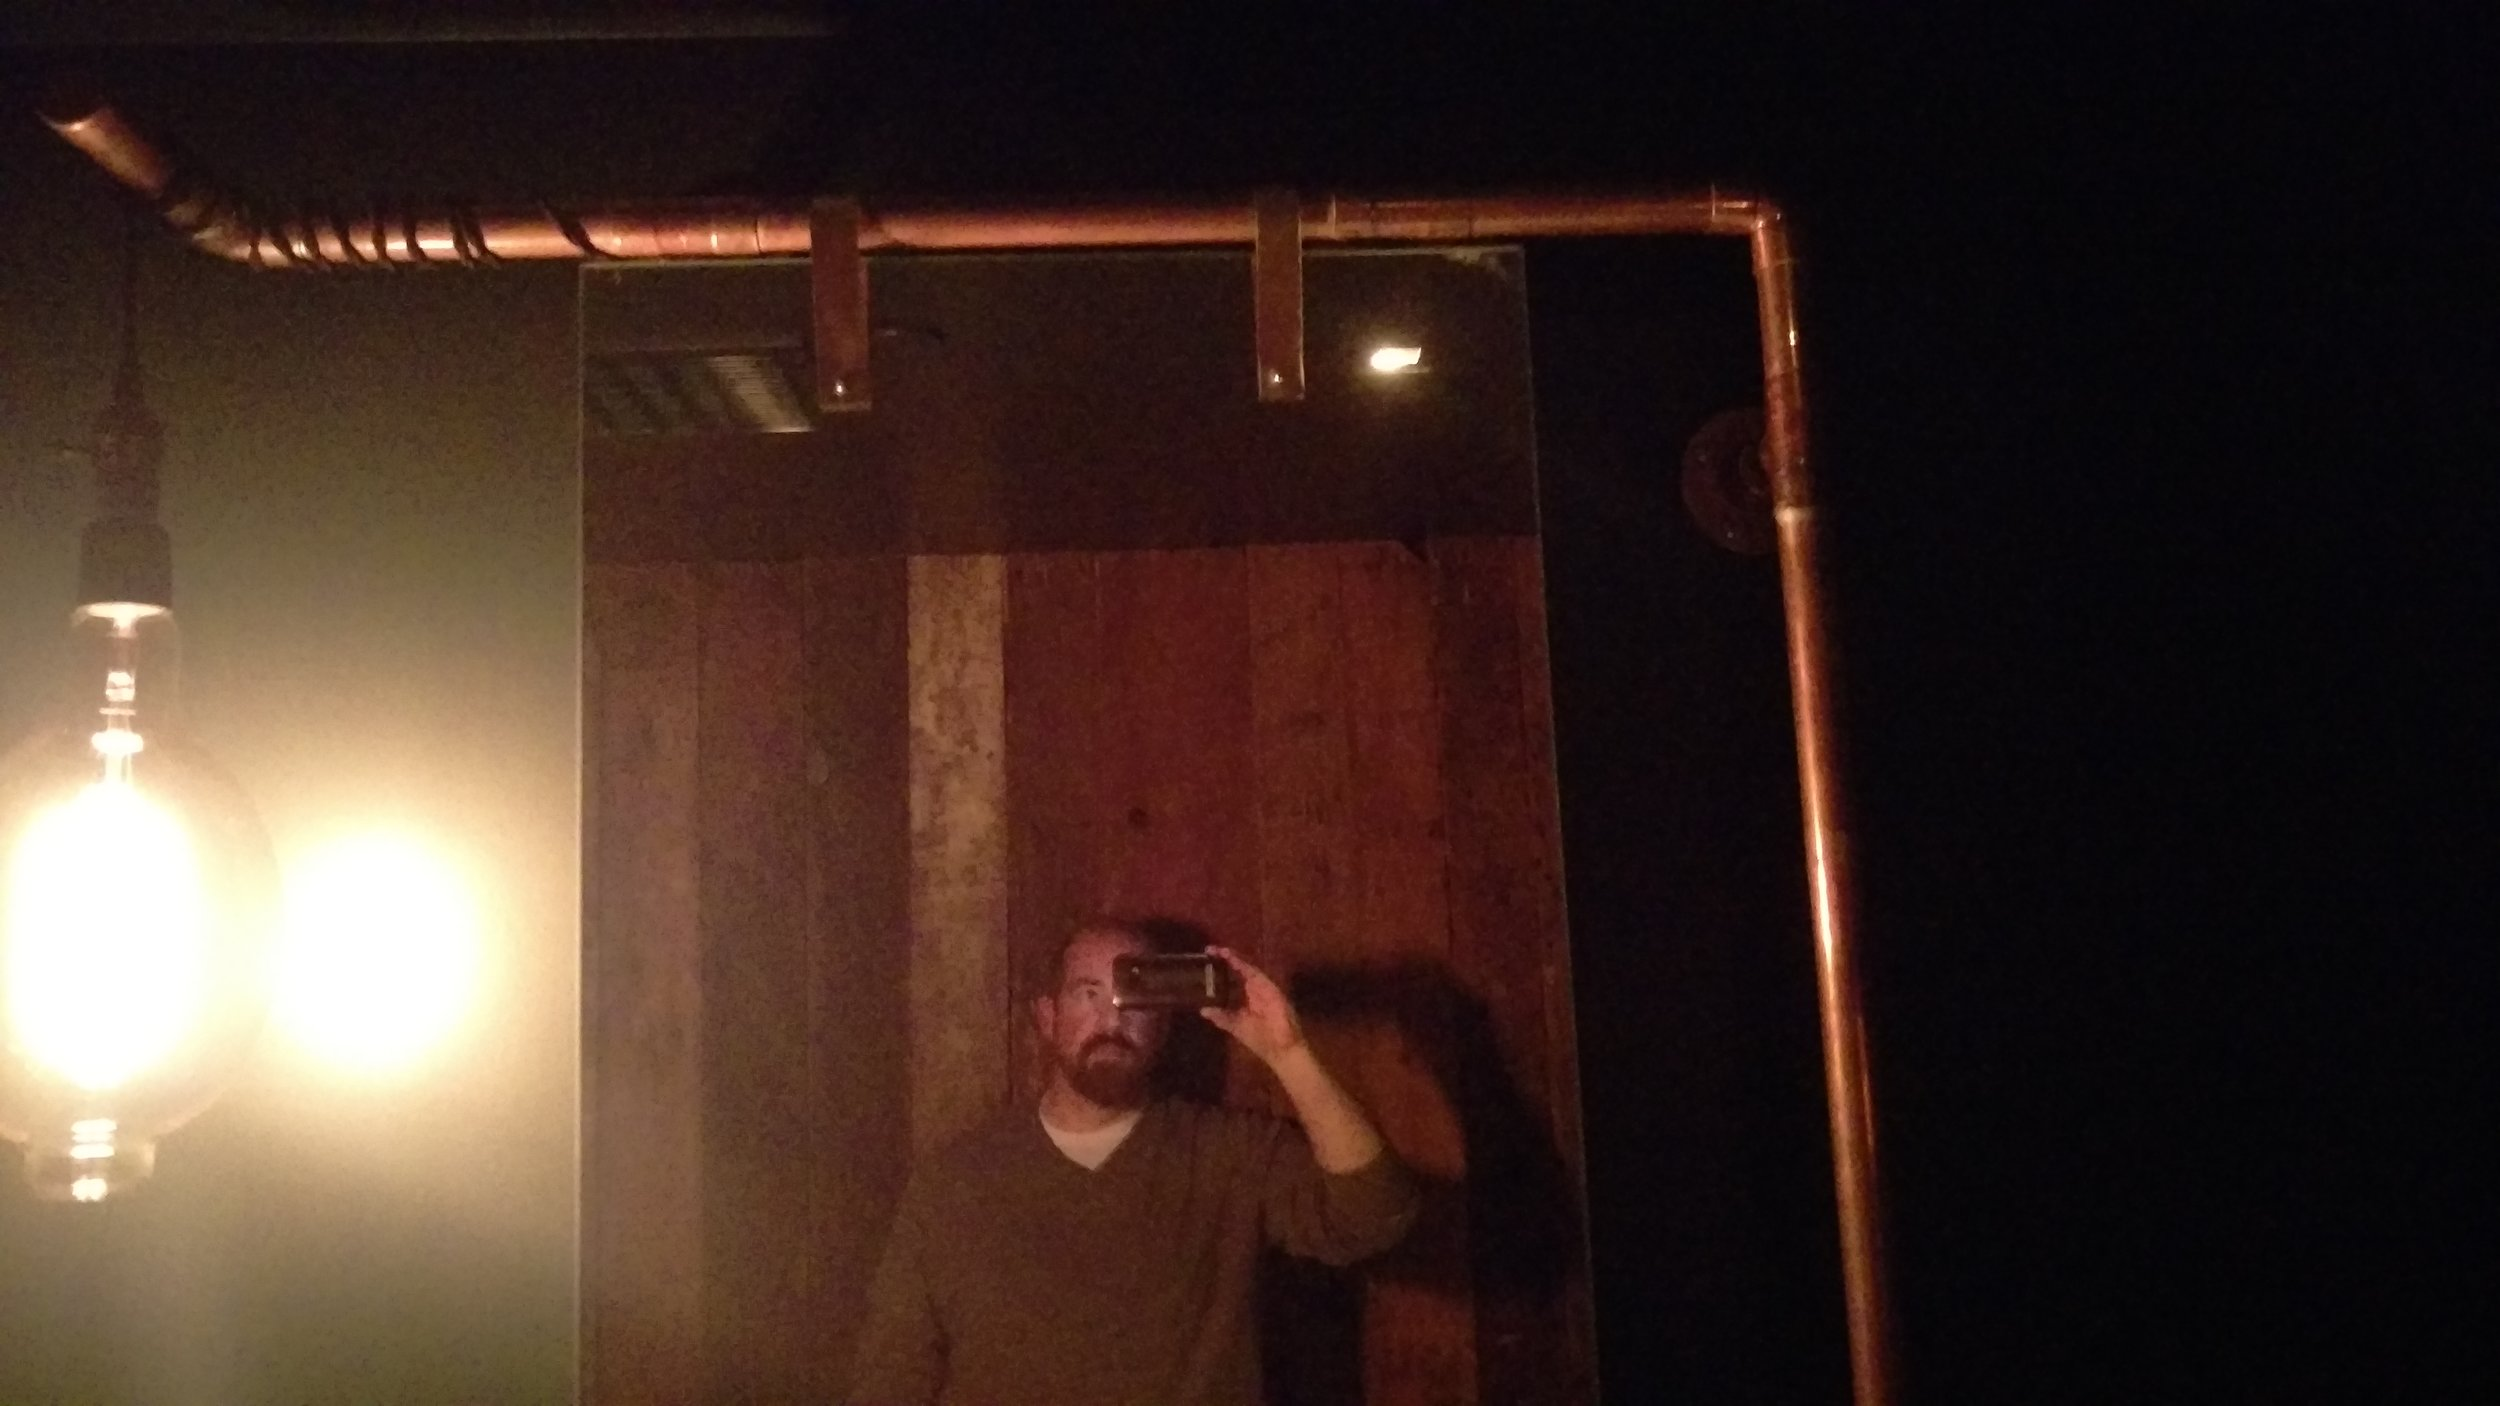 Hipster bathroom